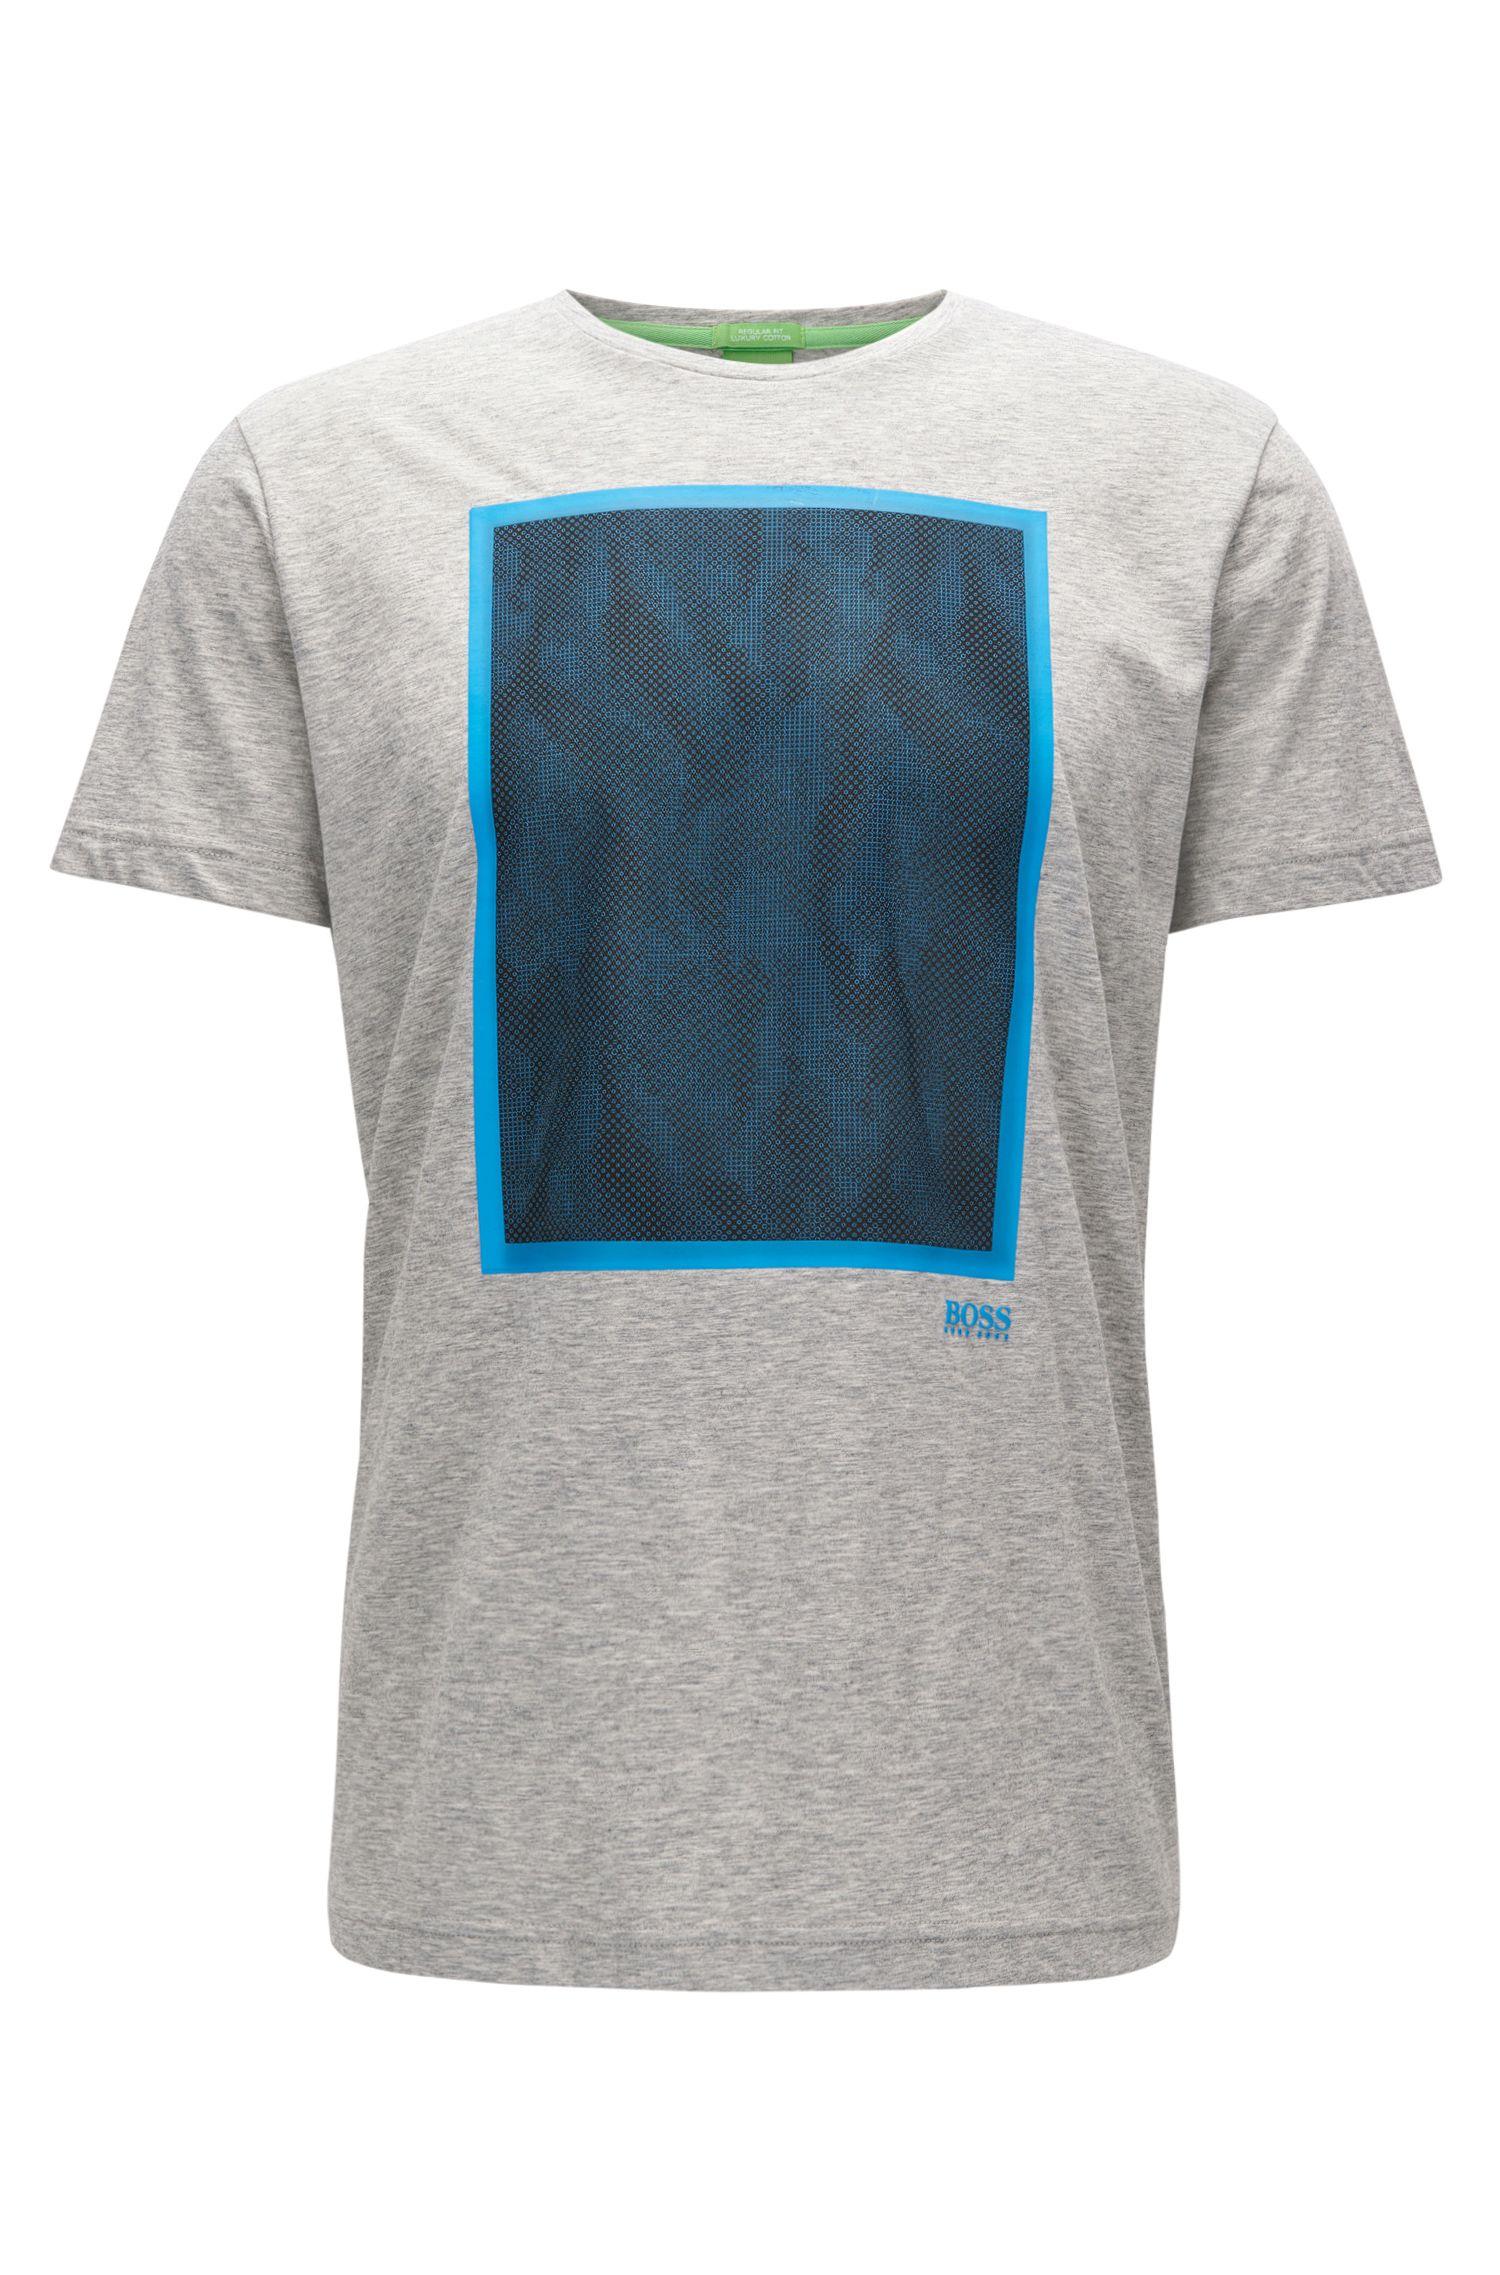 Mesh-Print Cotton Graphic T-Shirt | Tee